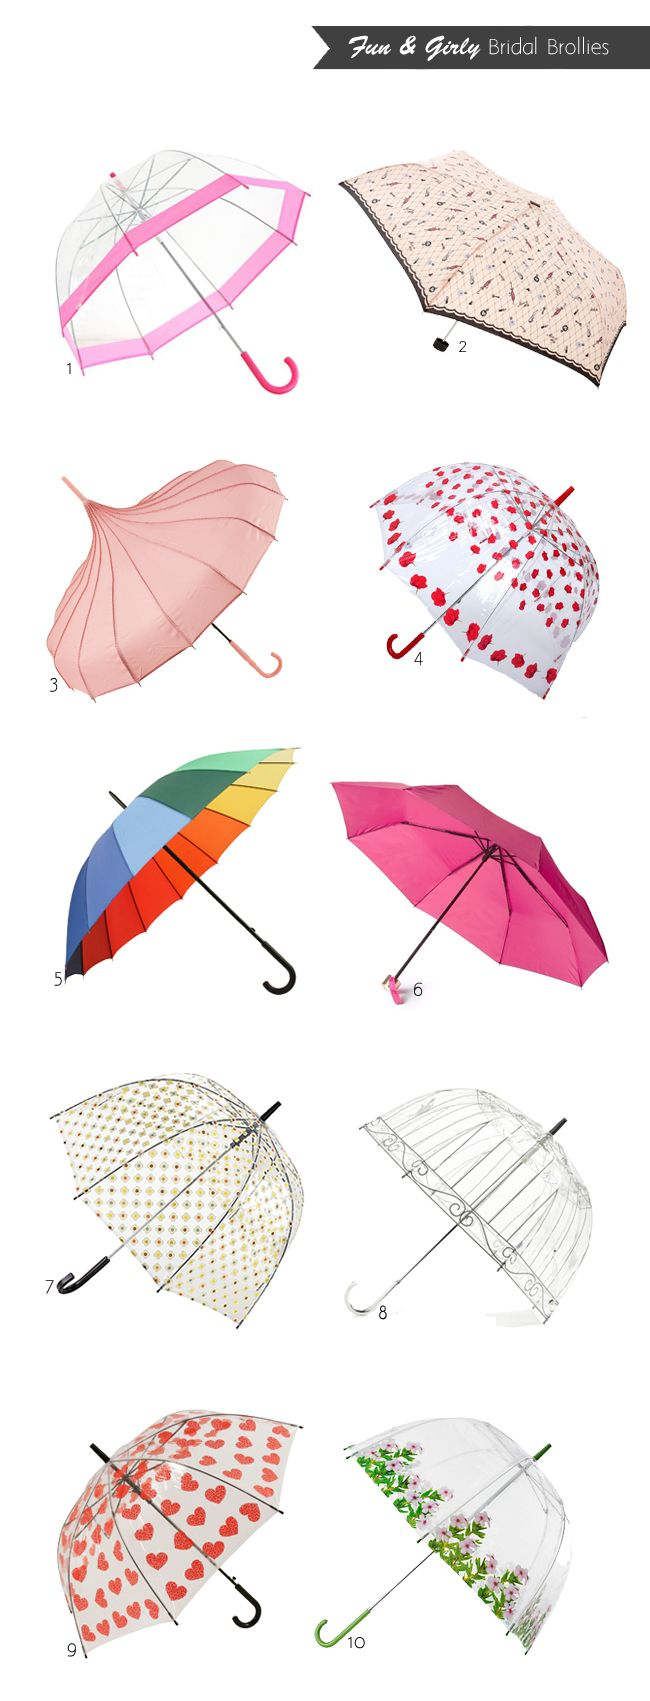 20 of the Best Wedding Umbrellas #bestumbrella